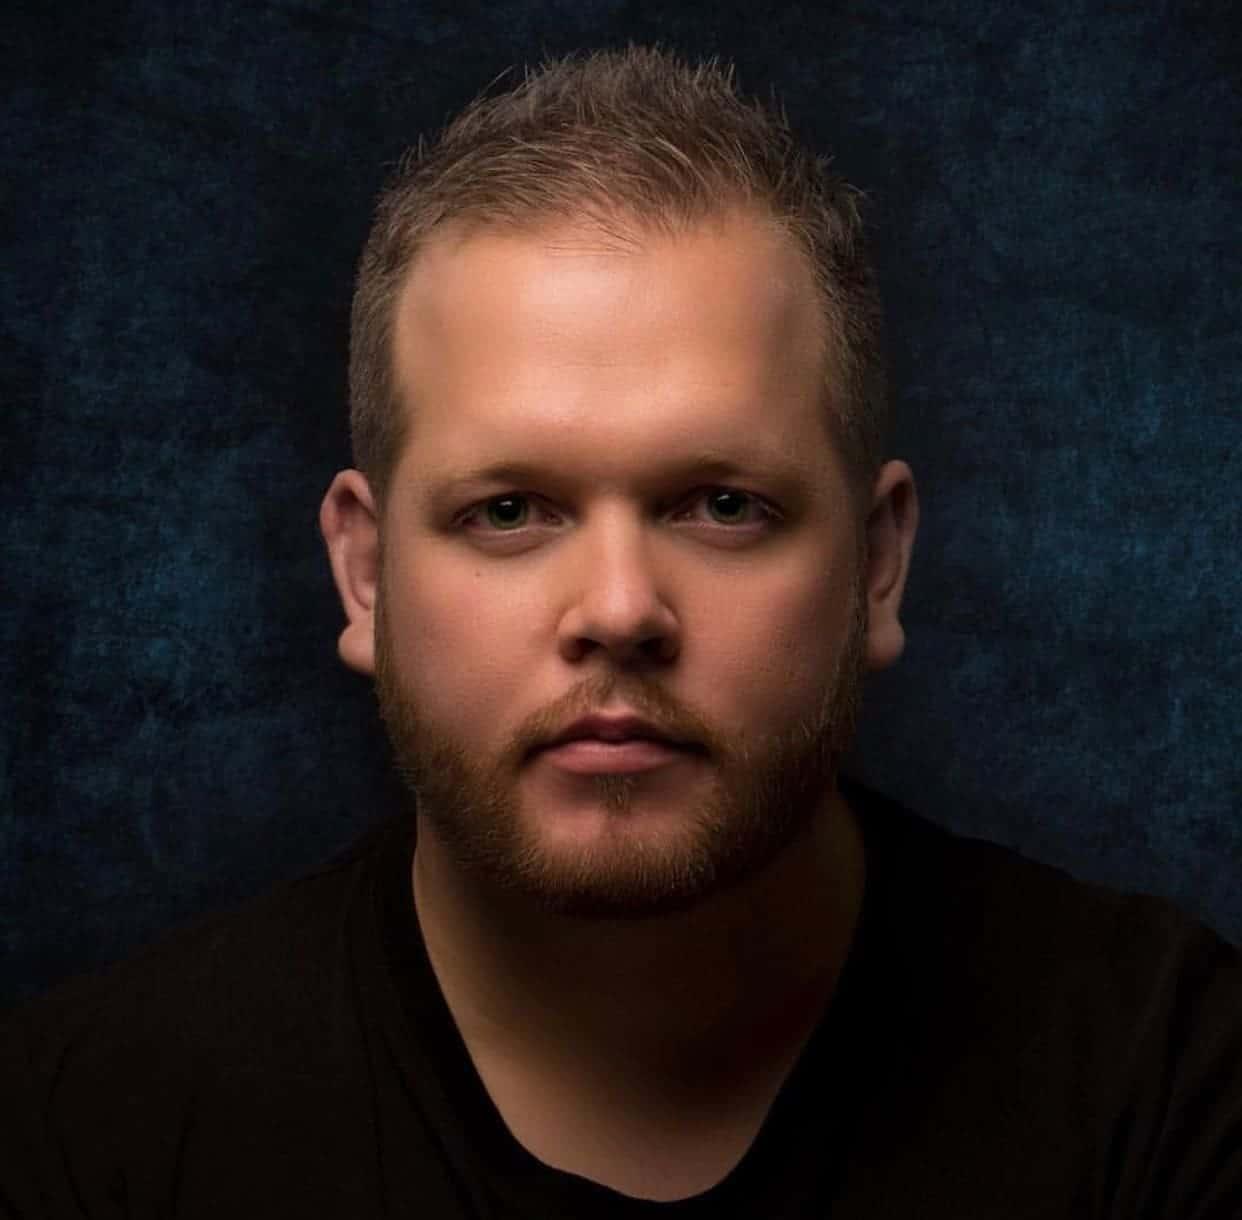 Marius Andresen